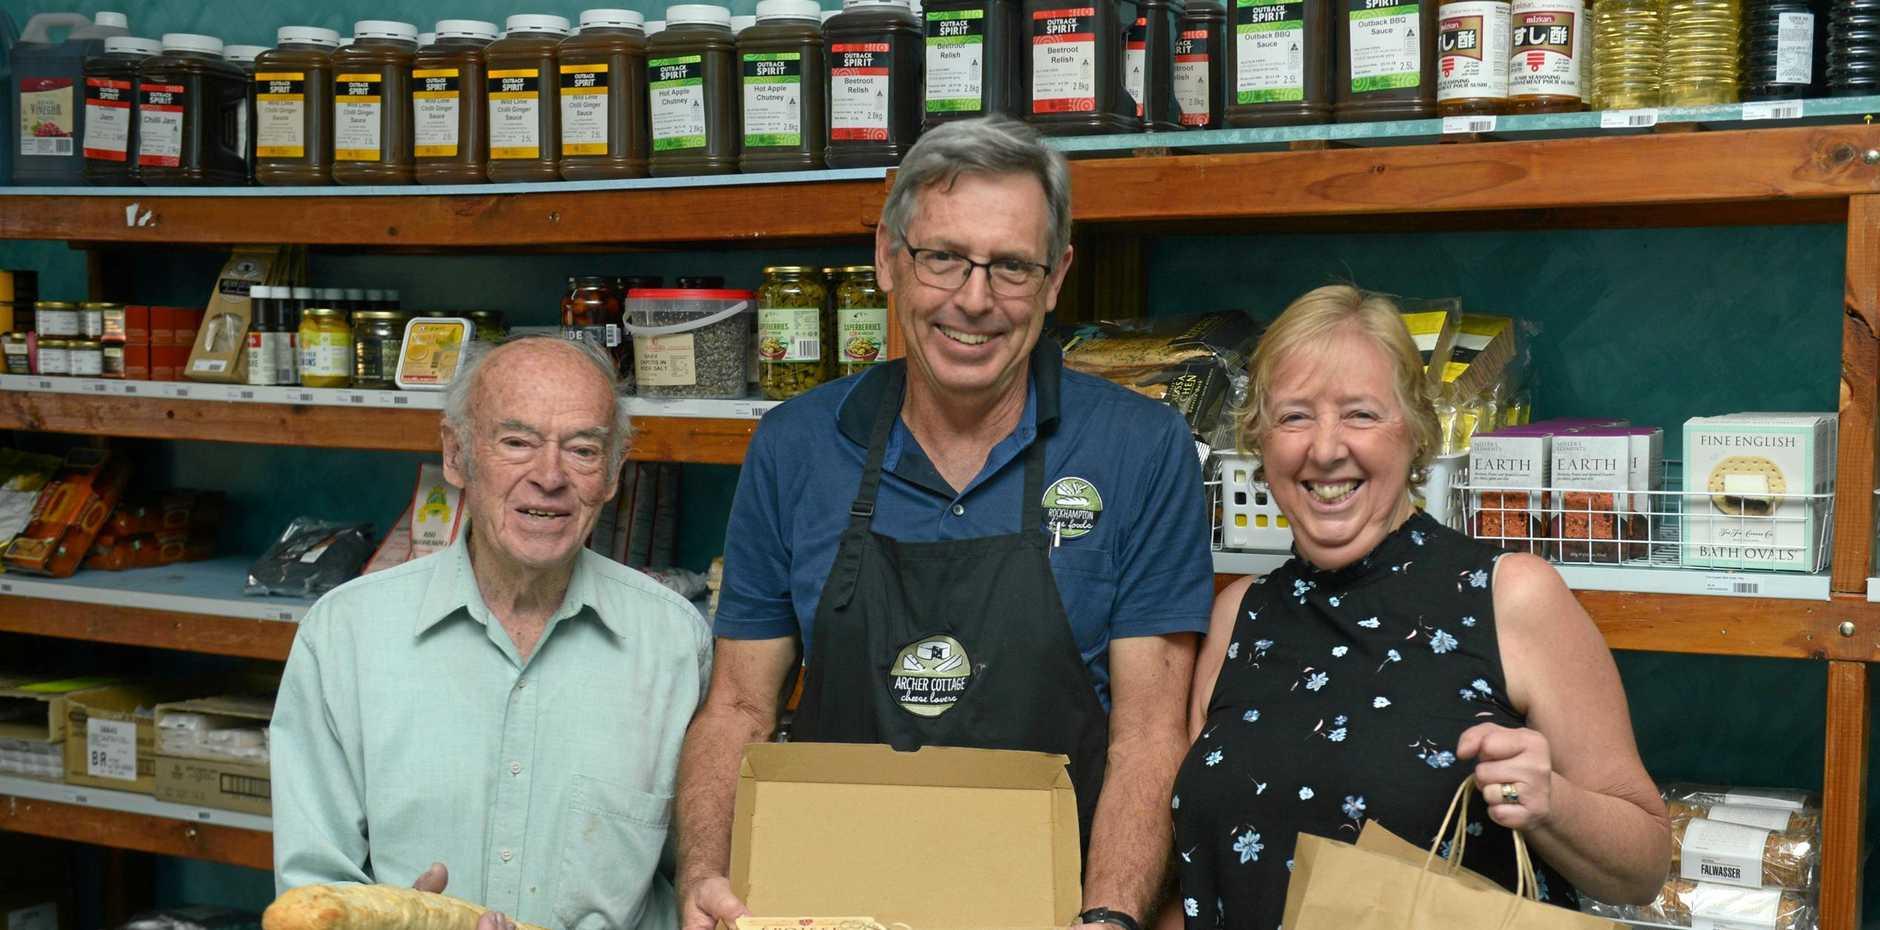 FROMMAGE FRIENDS: John Rasch of Adelaide, John Evans of Rockhampton Fine Foods and Susan Hagan say 'cheese' at Rockhampton Fine Foods.